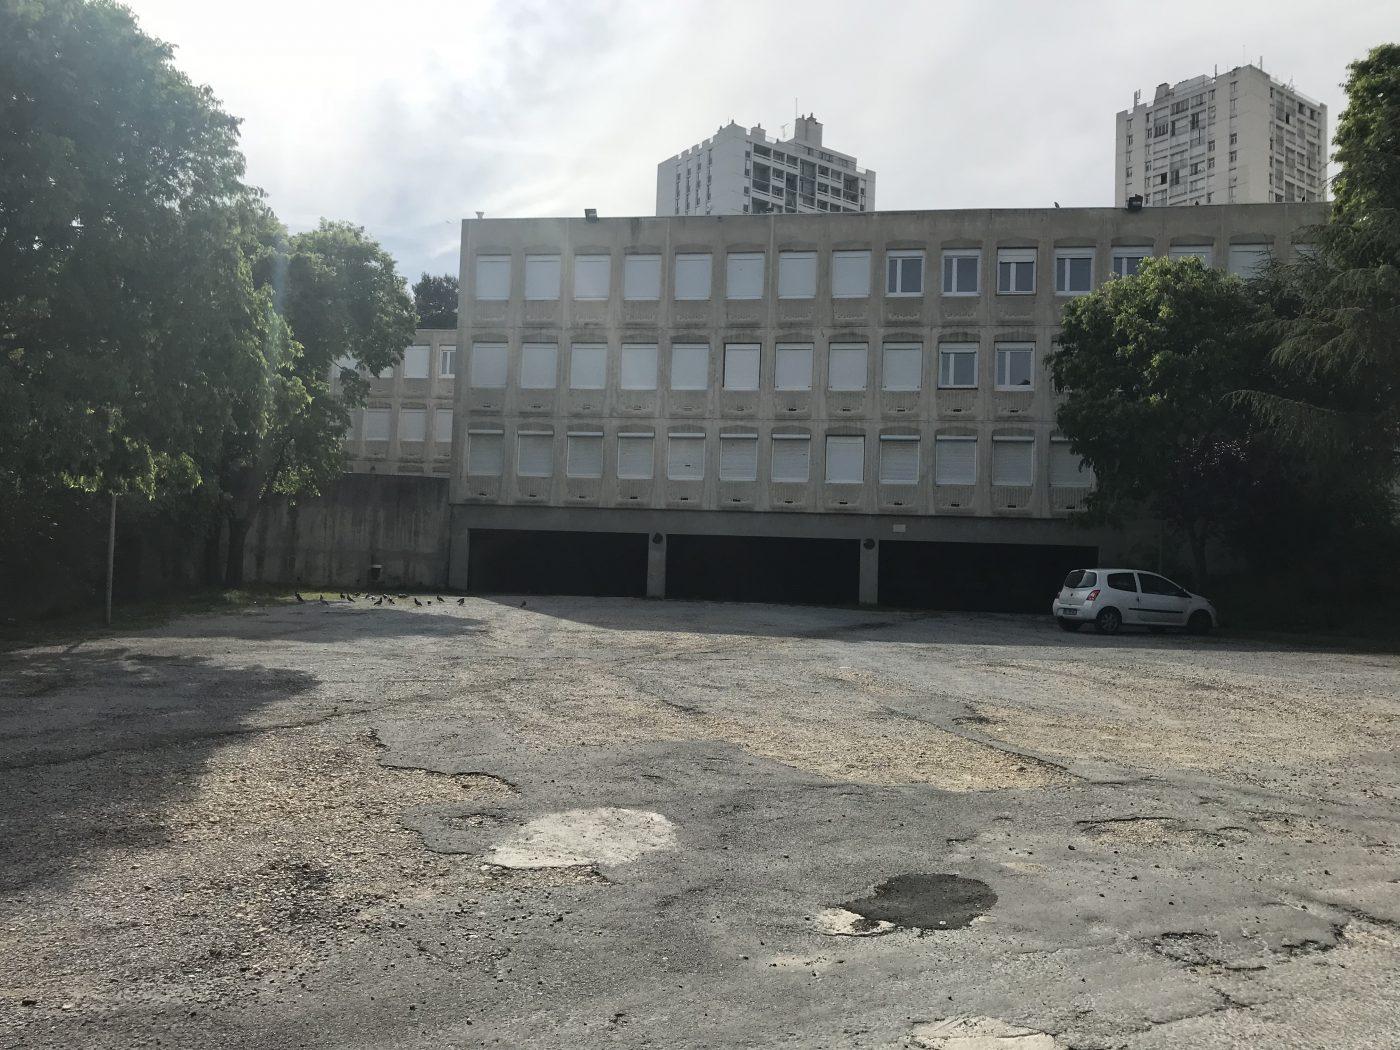 ancien collège Diderot